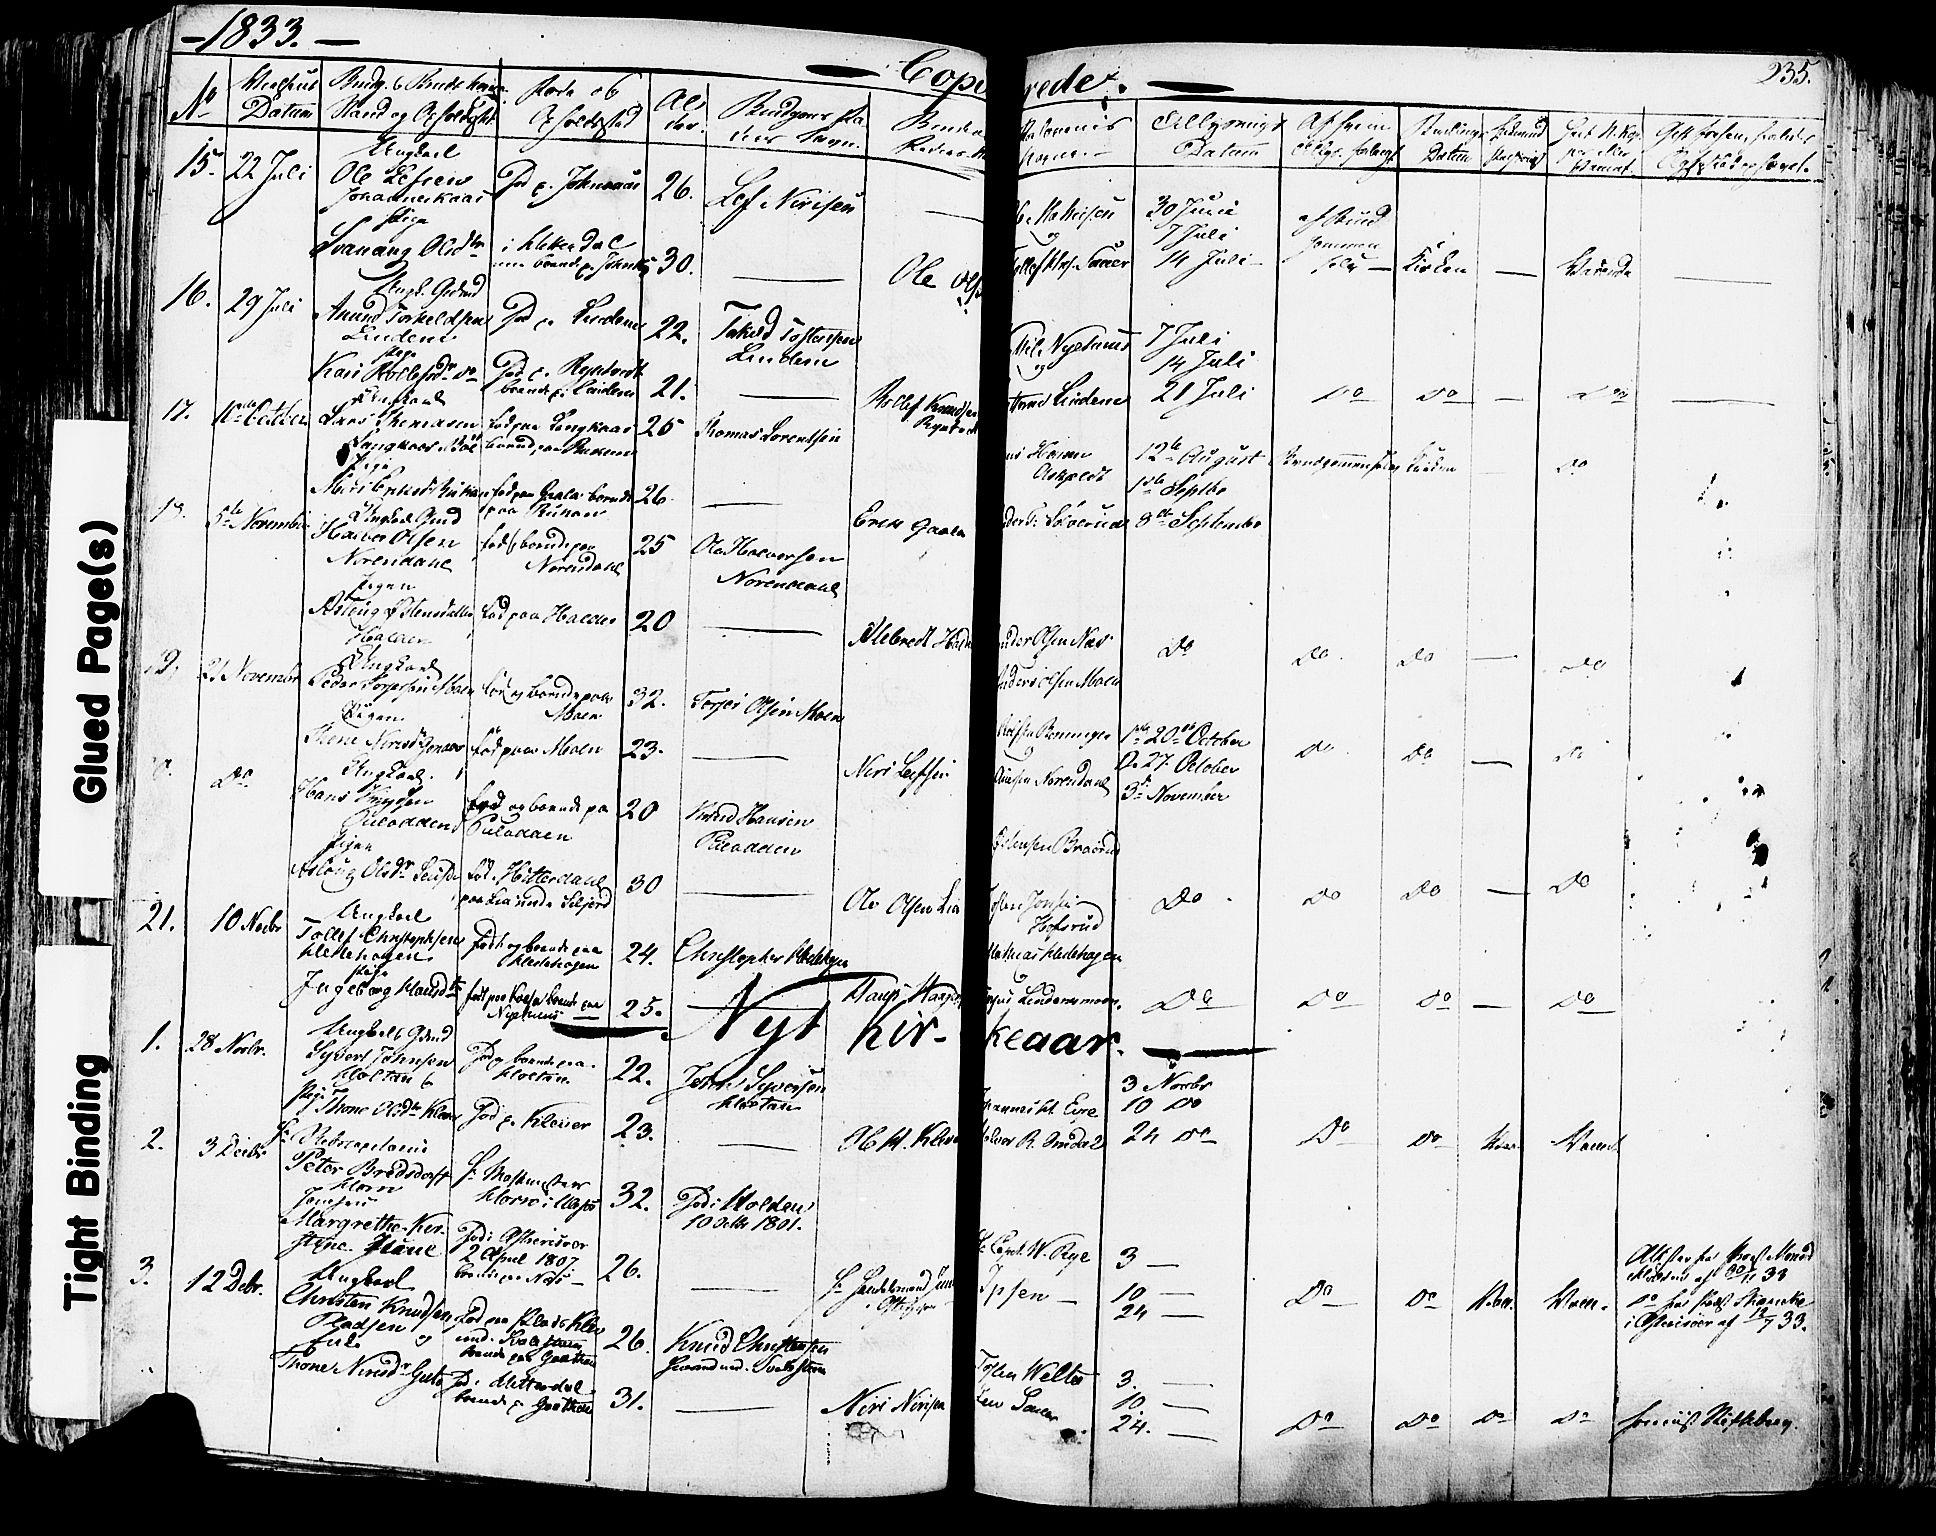 SAKO, Sauherad kirkebøker, F/Fa/L0006: Ministerialbok nr. I 6, 1827-1850, s. 235